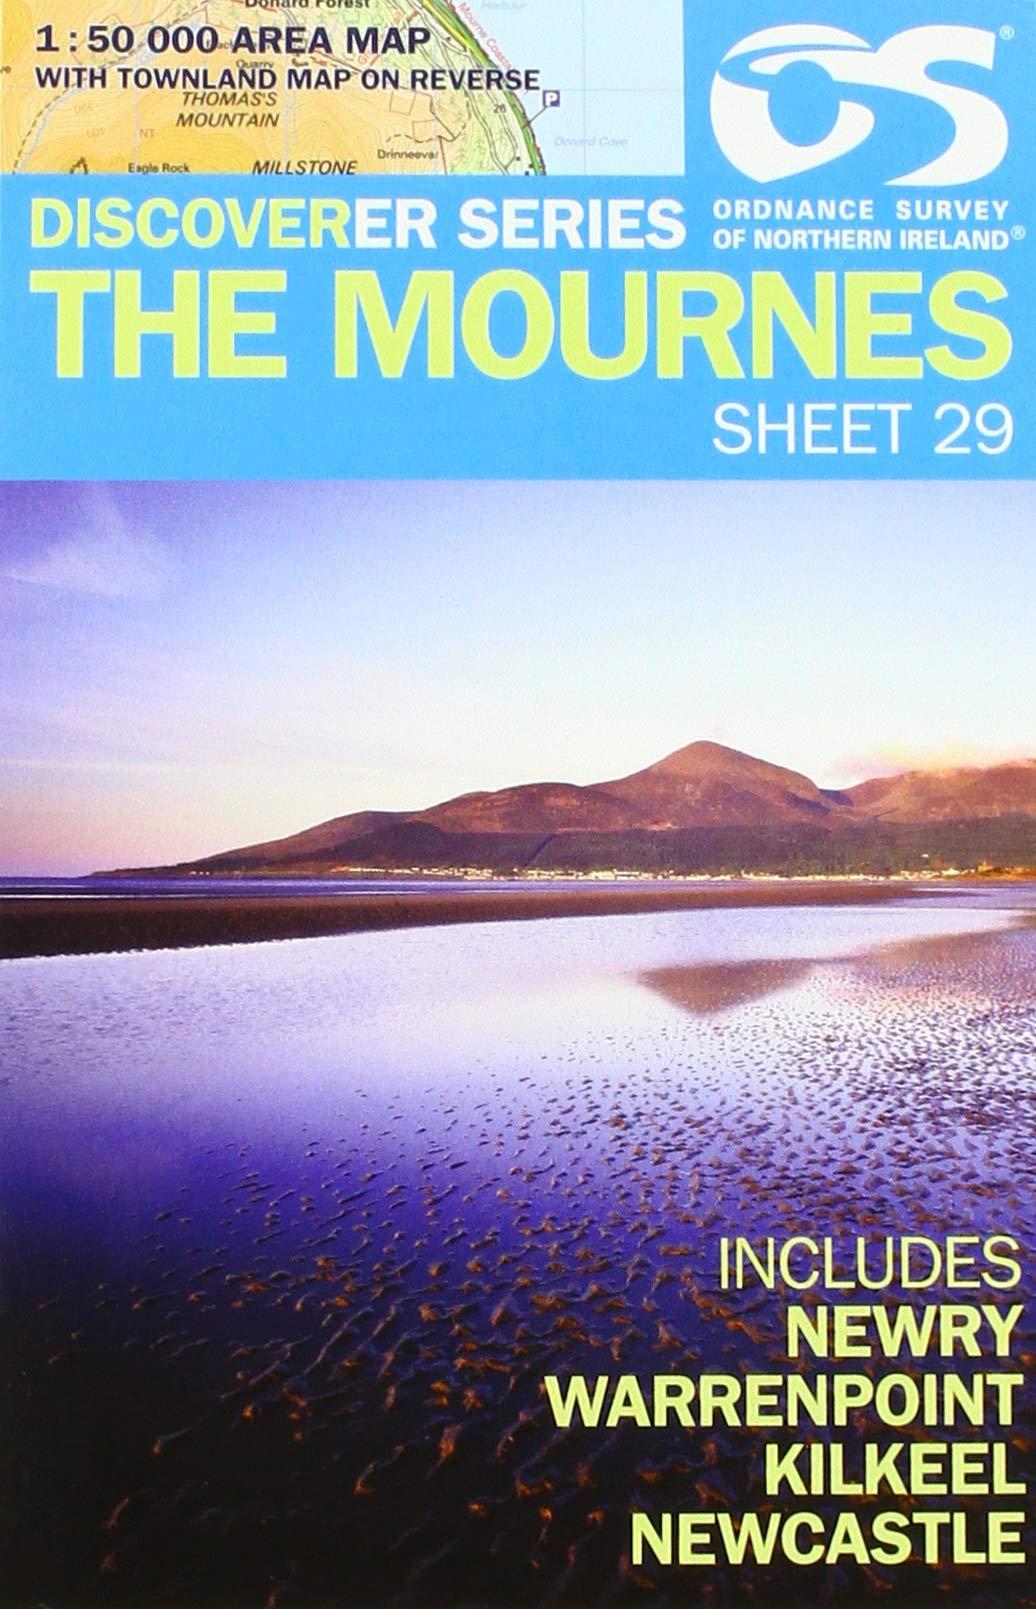 Wandelkaart 29 Discoverer The Mournes | Ordnance Survey Northern Ireland